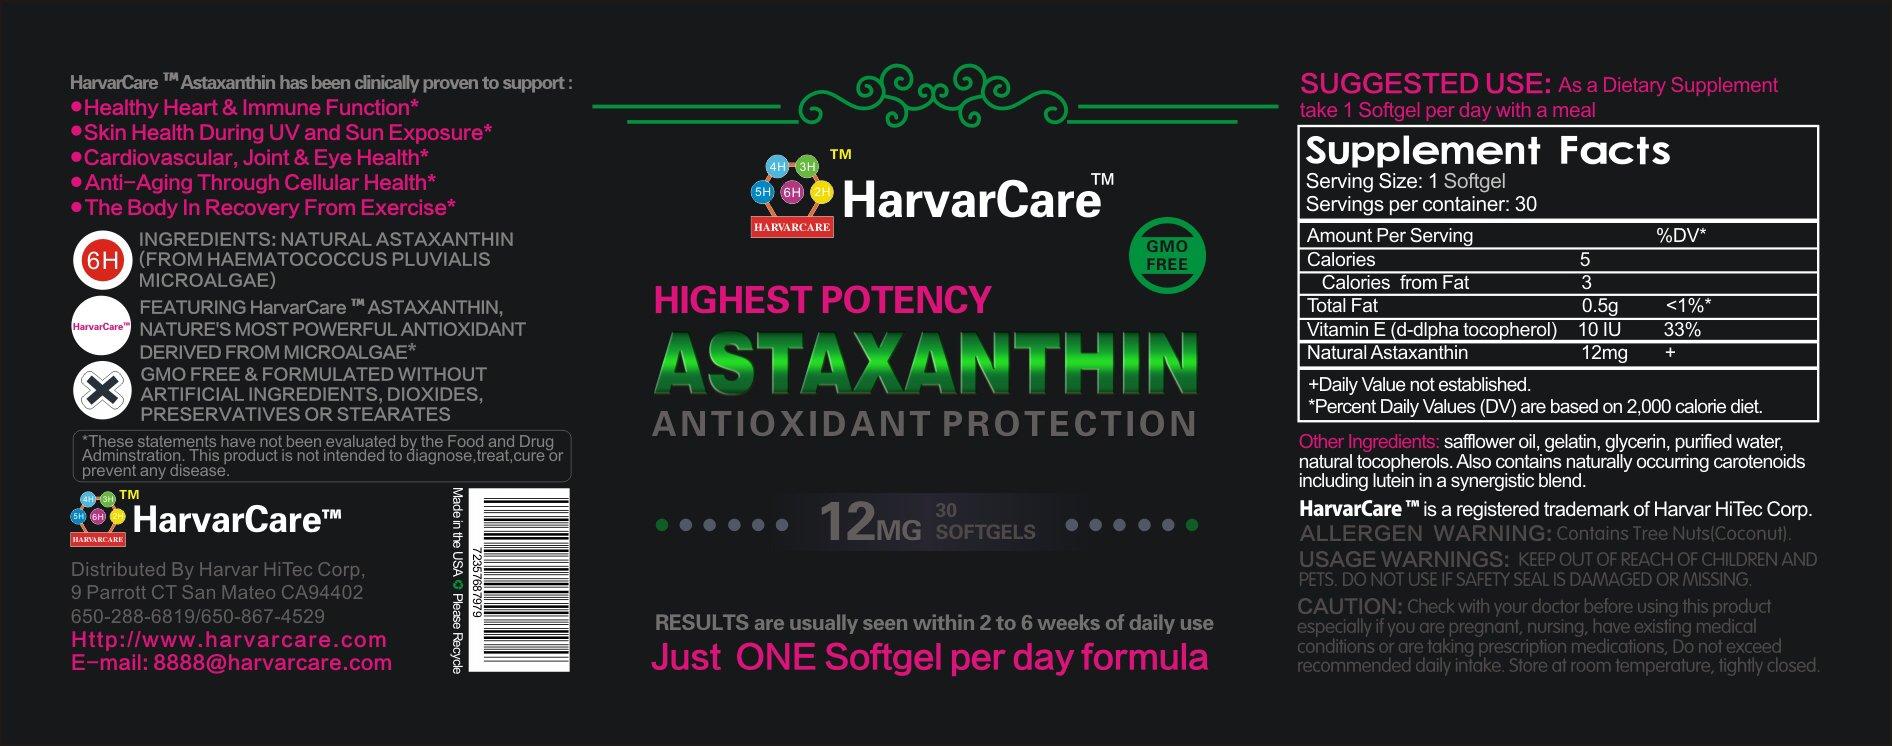 Astaxanthin 12mg (pack of 12)